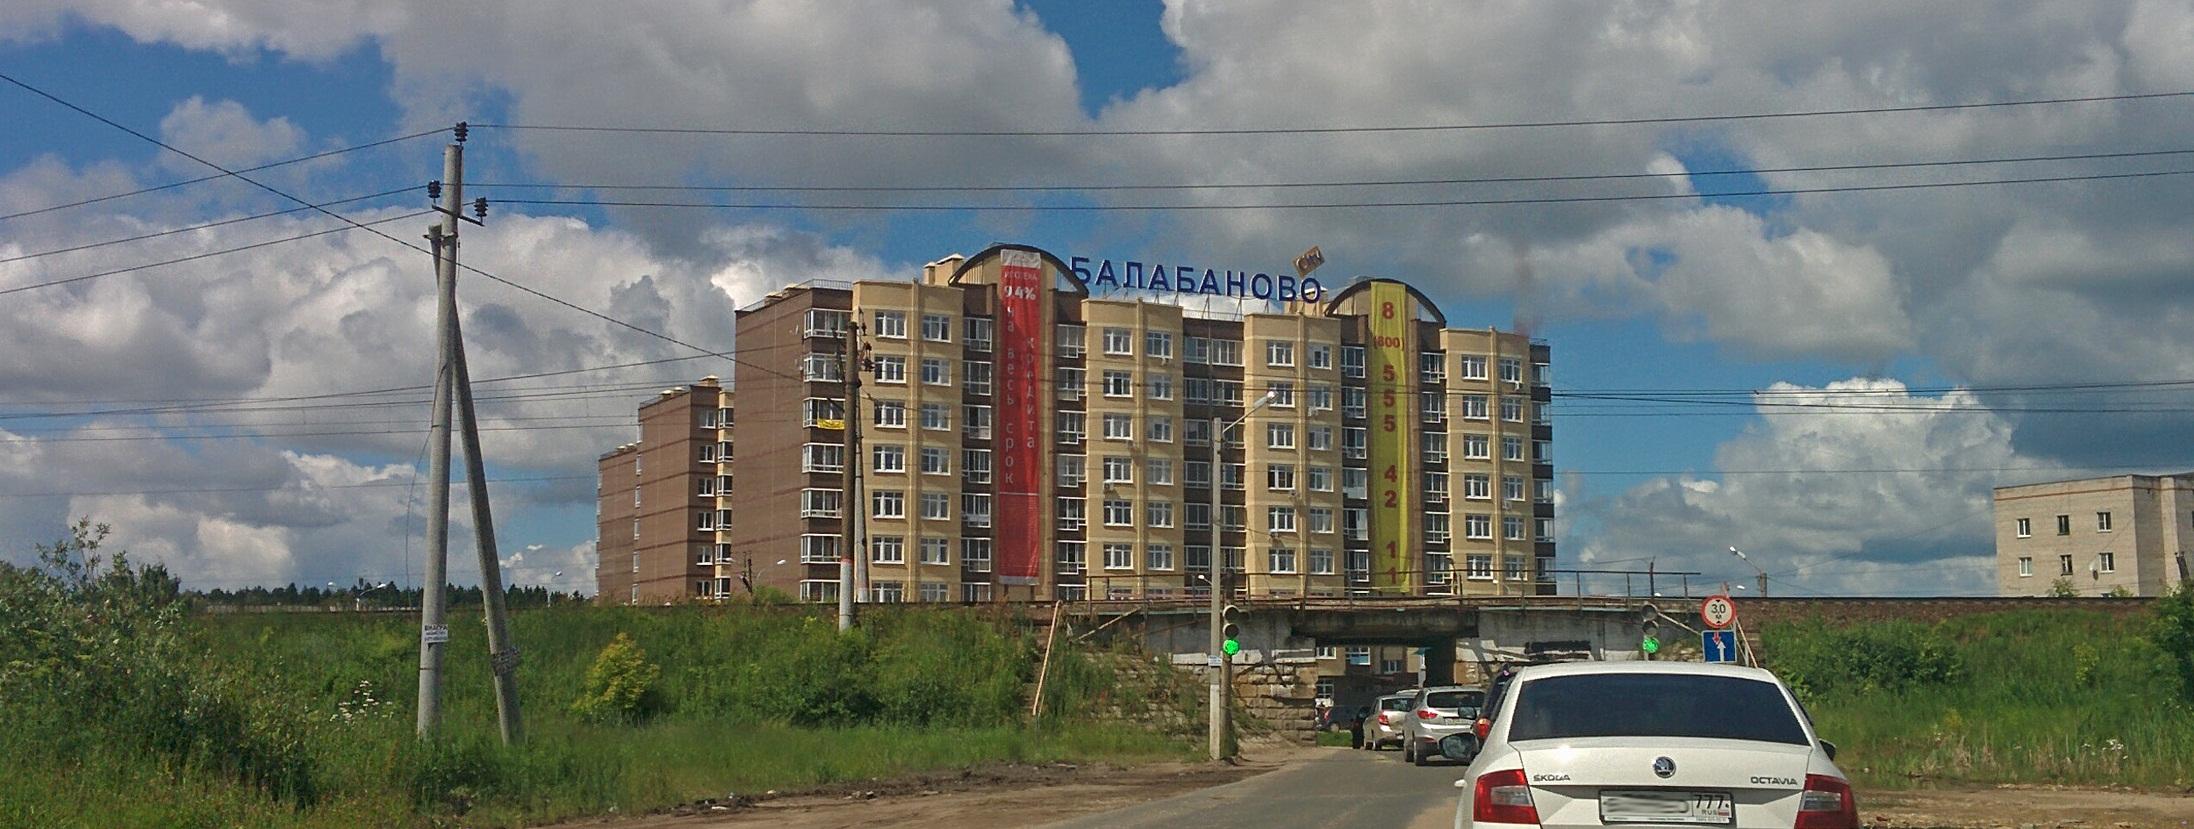 Грузоперевозки из Балабаново в Москву